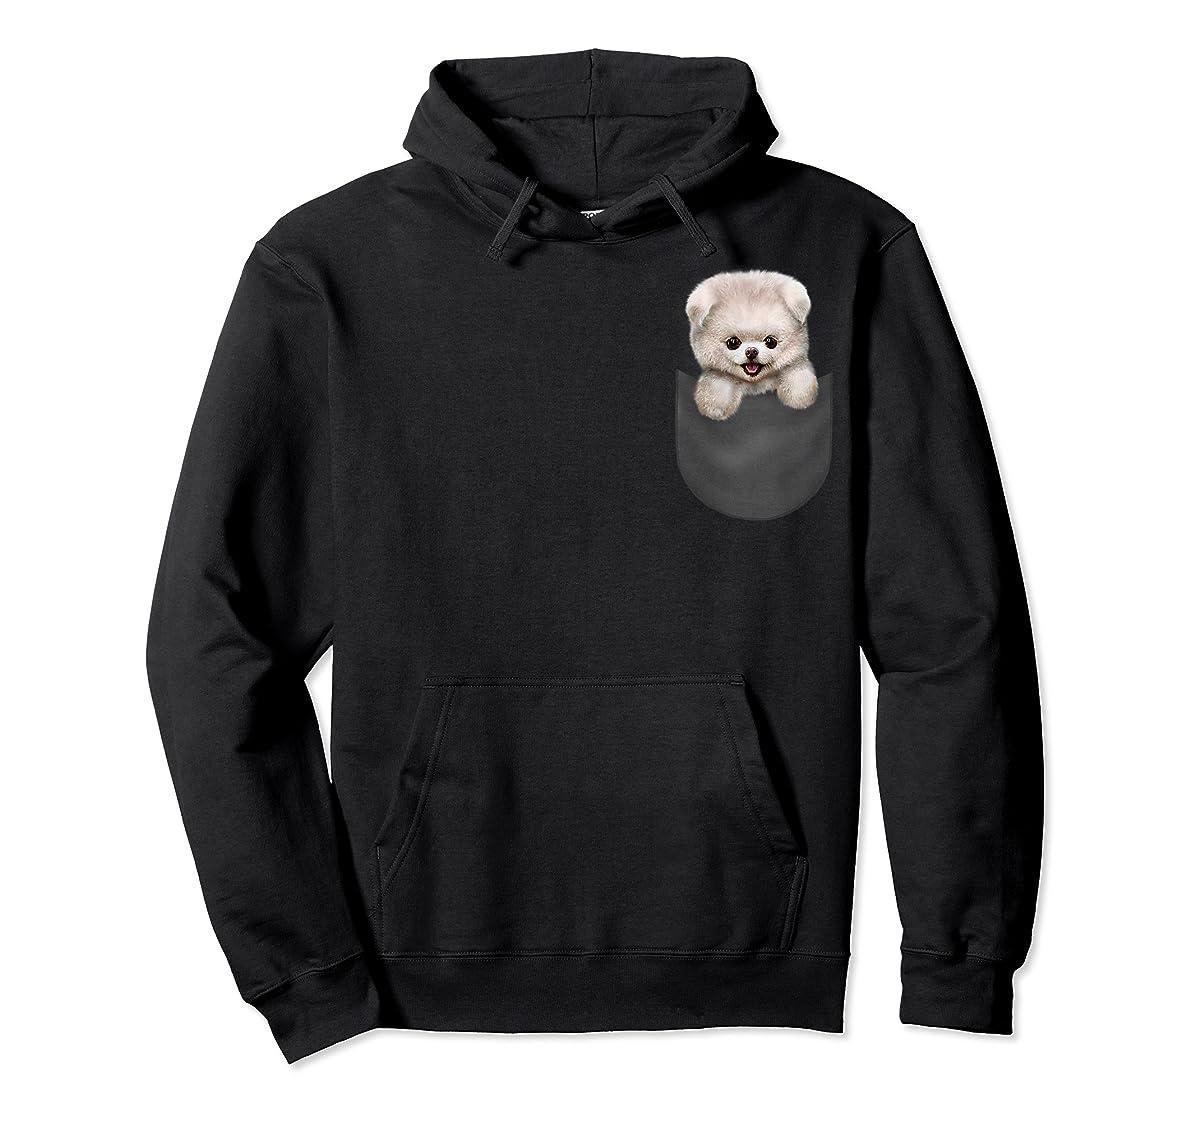 T-Shirt, Cute White Fluffy Pomeranian Puppy in Pocket, Dog-Hoodie-Black